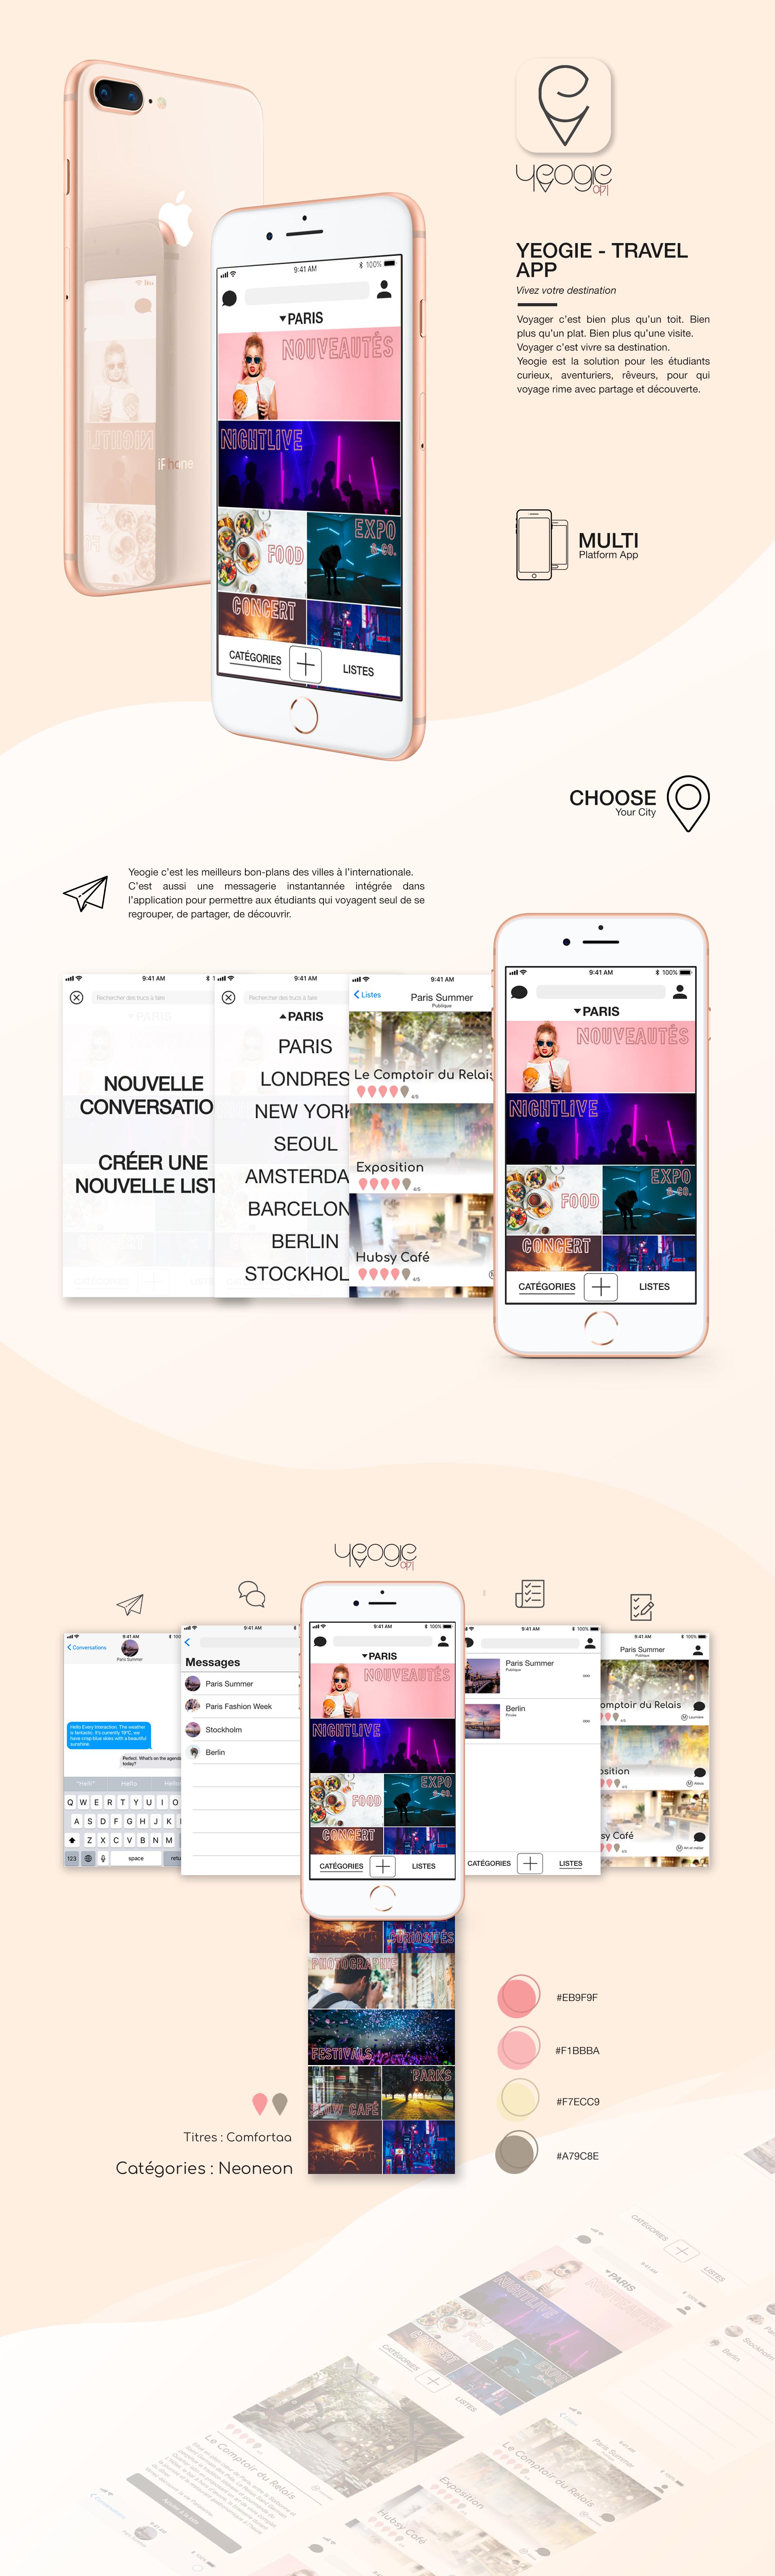 Yeogie app mockup design